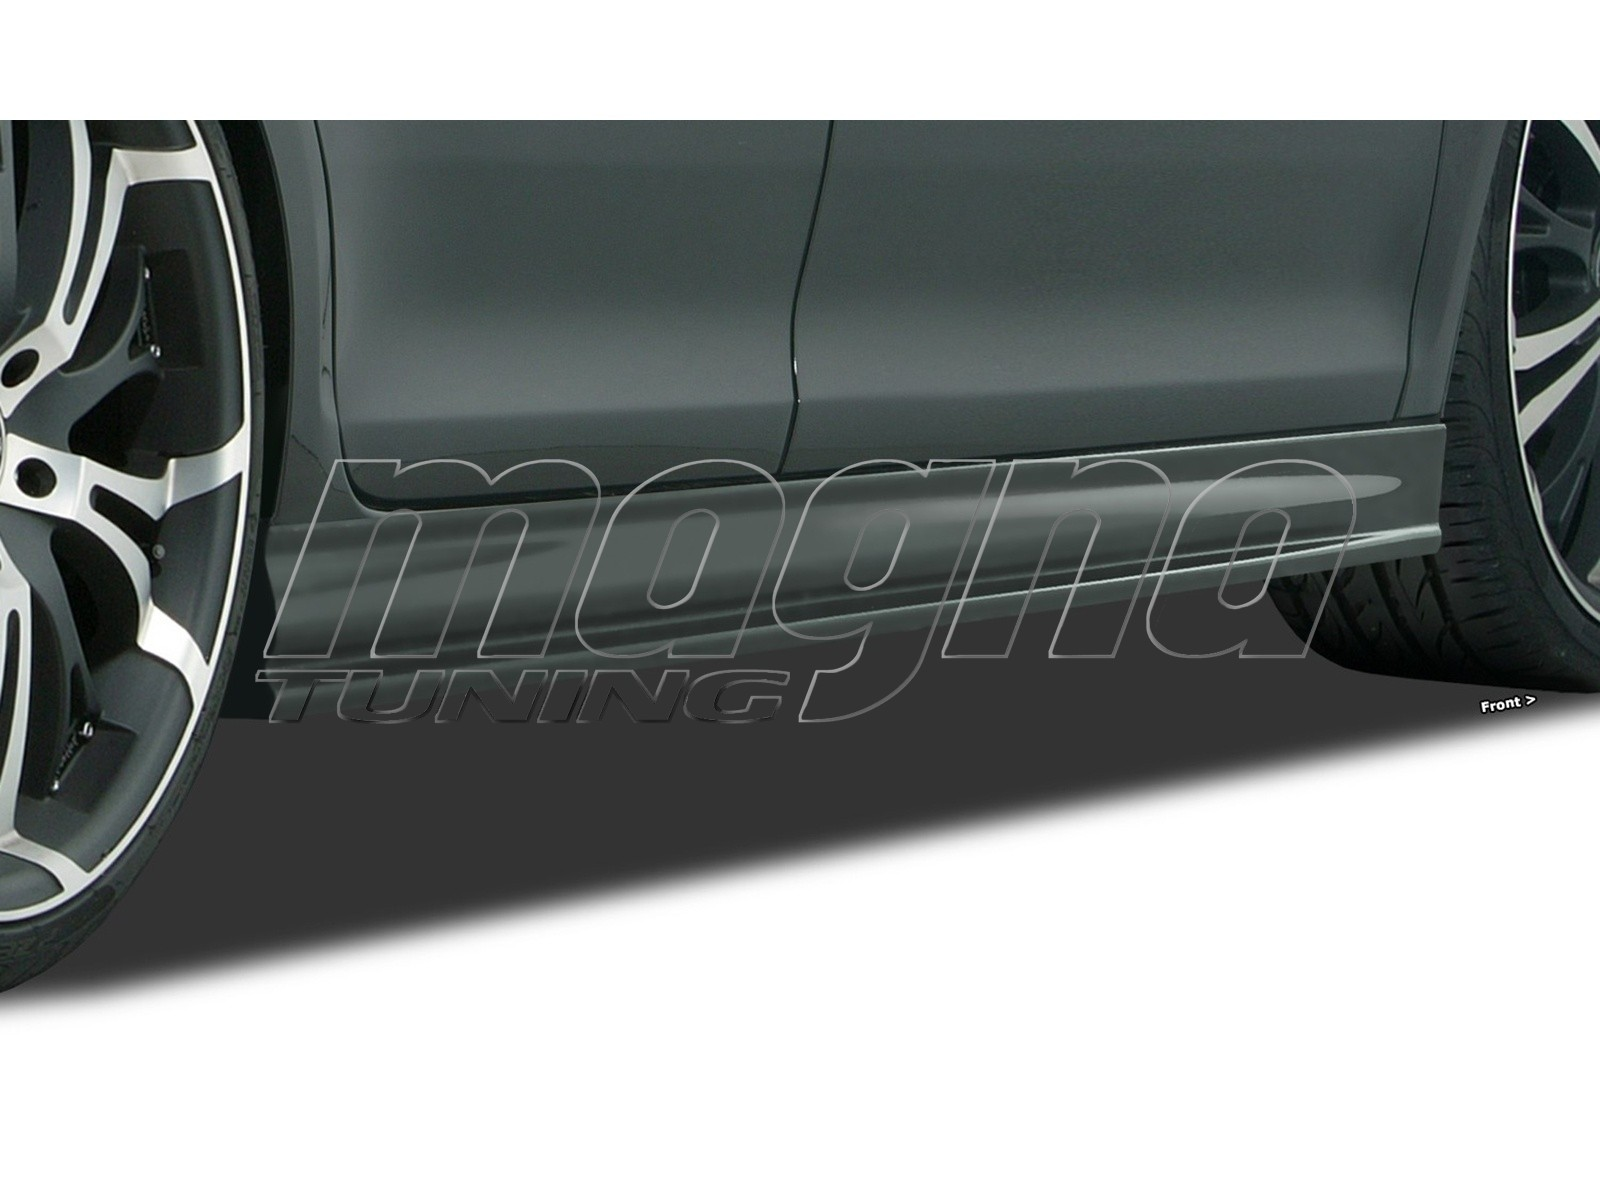 VW Polo 6N2 Evolva Side Skirts